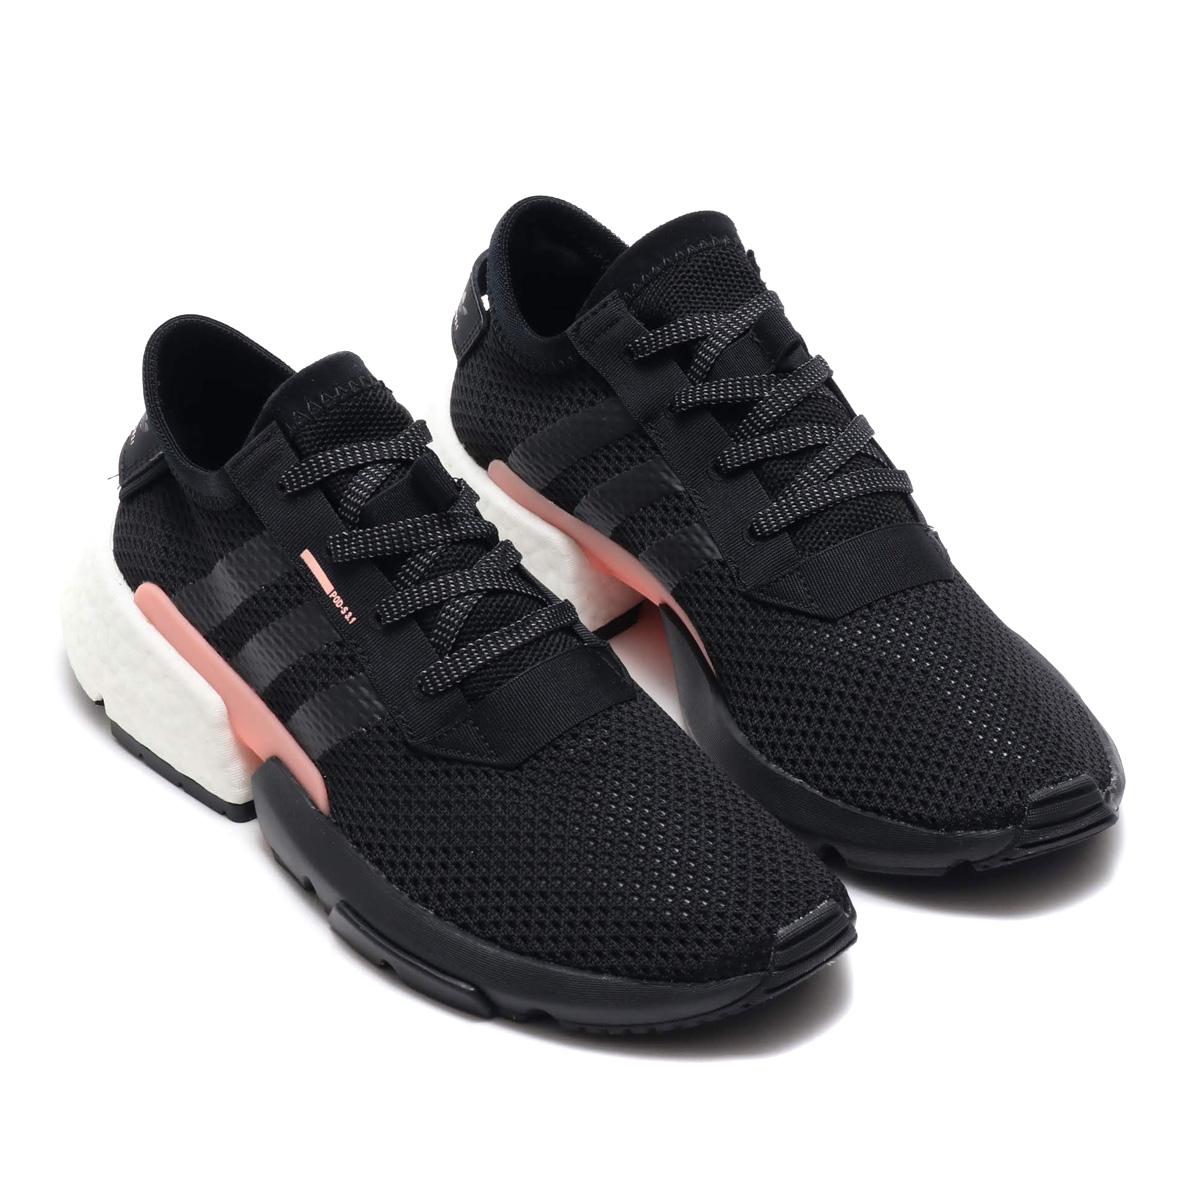 separation shoes 6e061 cbeda adidas POD-S3.1 (アディダスピーオーディー S3.1) core black  core black  clear orange  F18 18FW-I